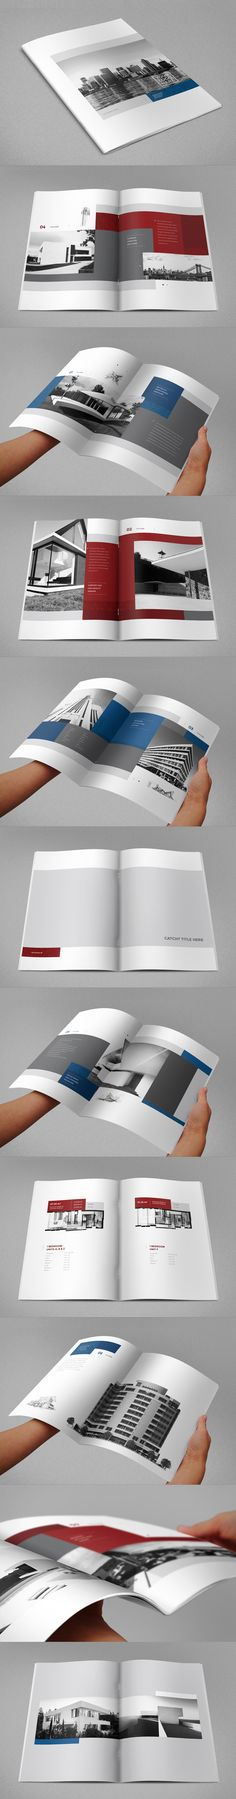 Real Estate Brochure 3. Download here: http://graphicriver.net/item/real-estate-brochure-3/8466289?ref=abradesign #design #brochure